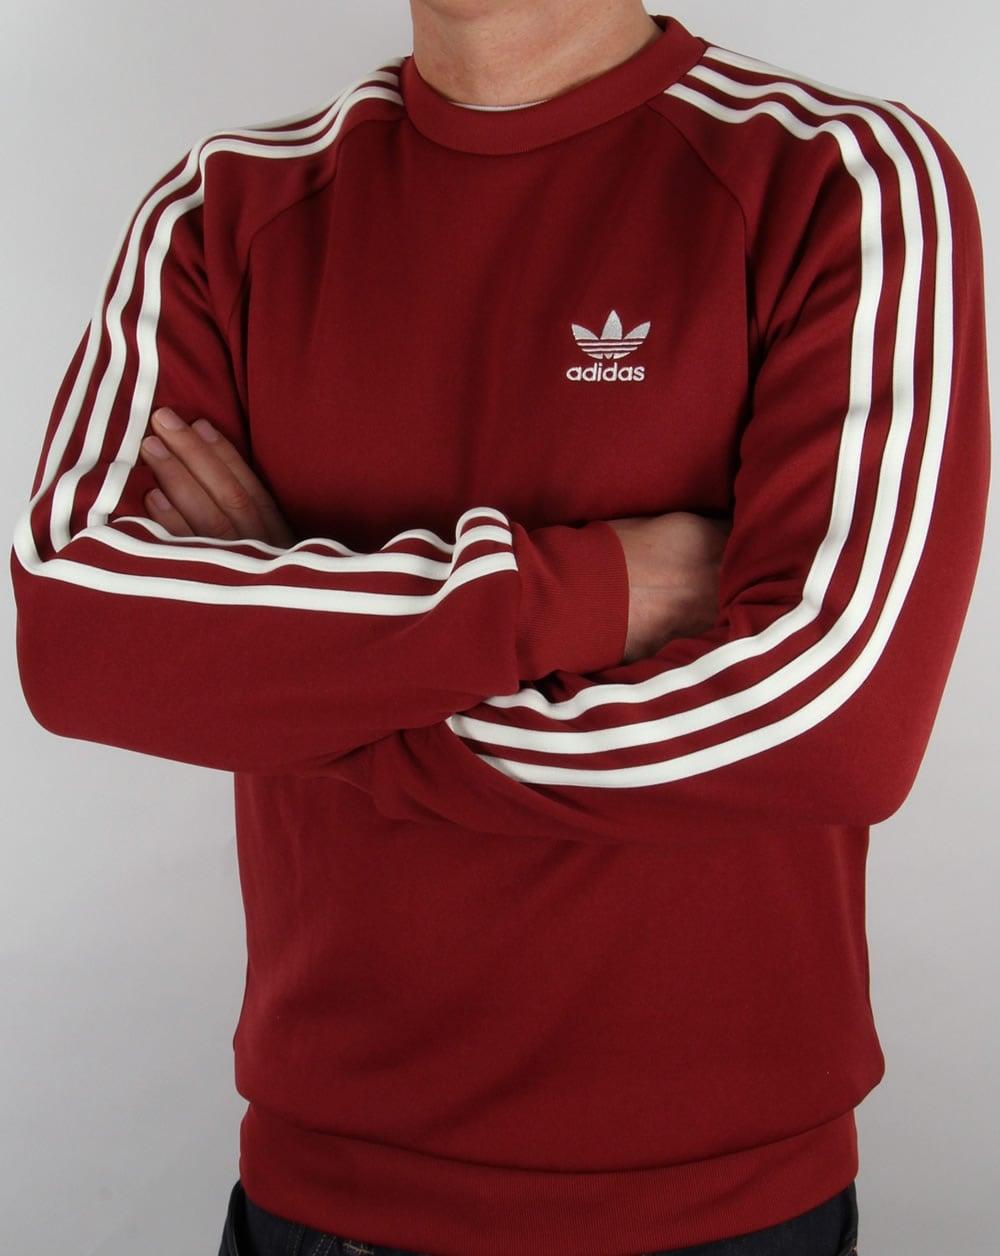 Adidas Originali Superstar Suicidio, Collo Mistero Rosso, Collo, Suicidio, Superstar Uomo 6fb5c2